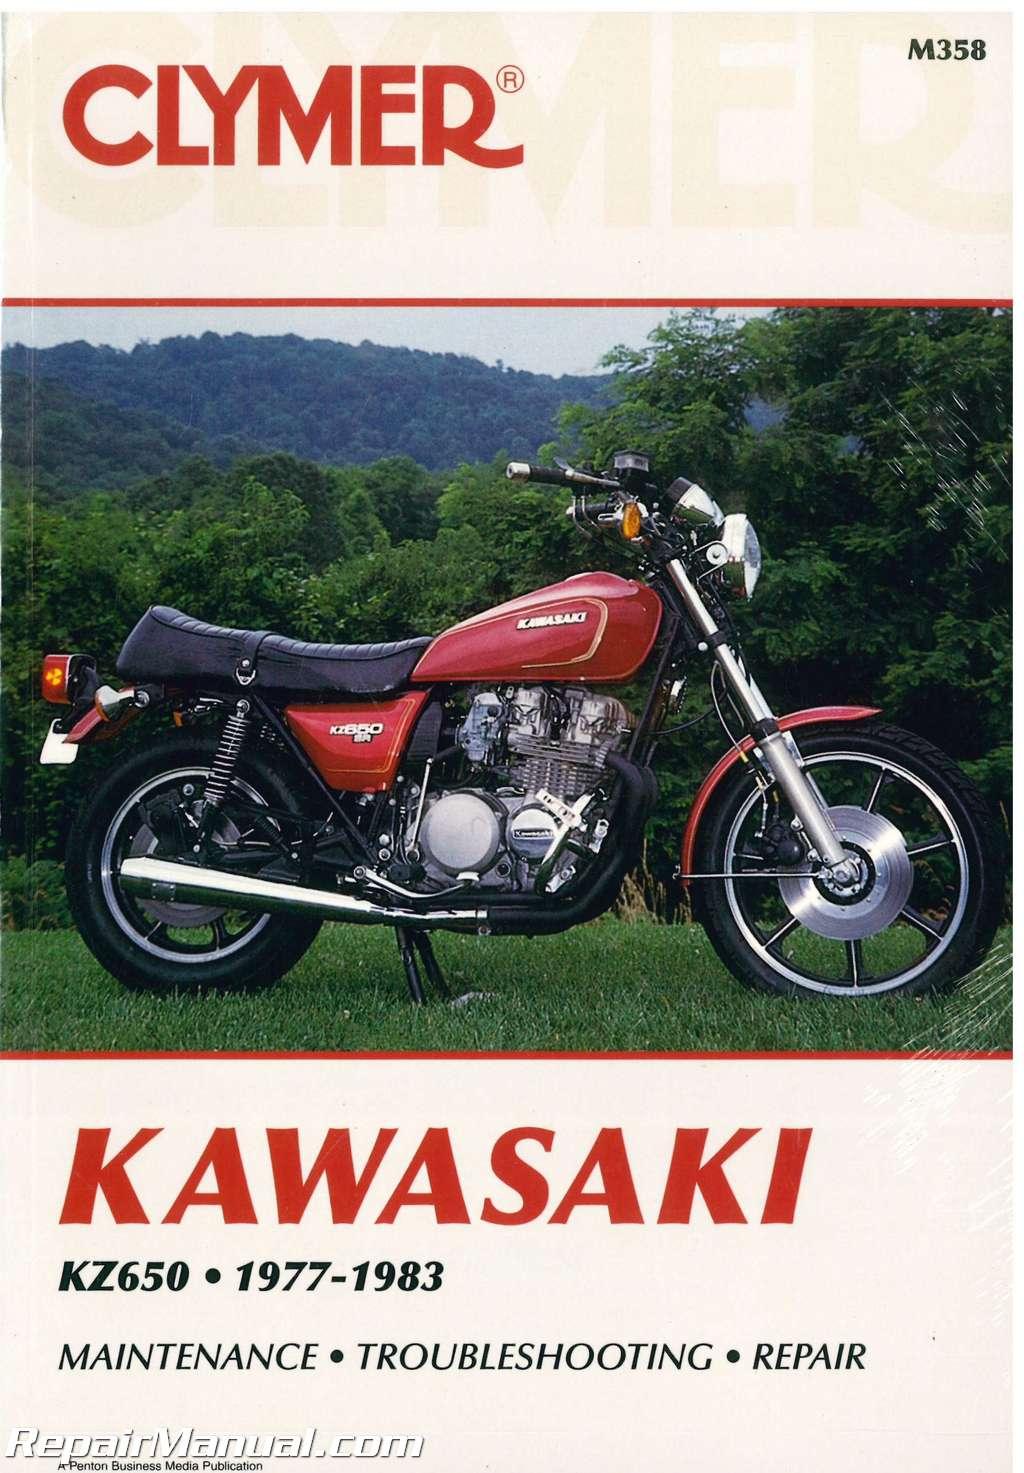 Kawasaki Kz650 1977 1983 Clymer Motorcycle Repair Manual